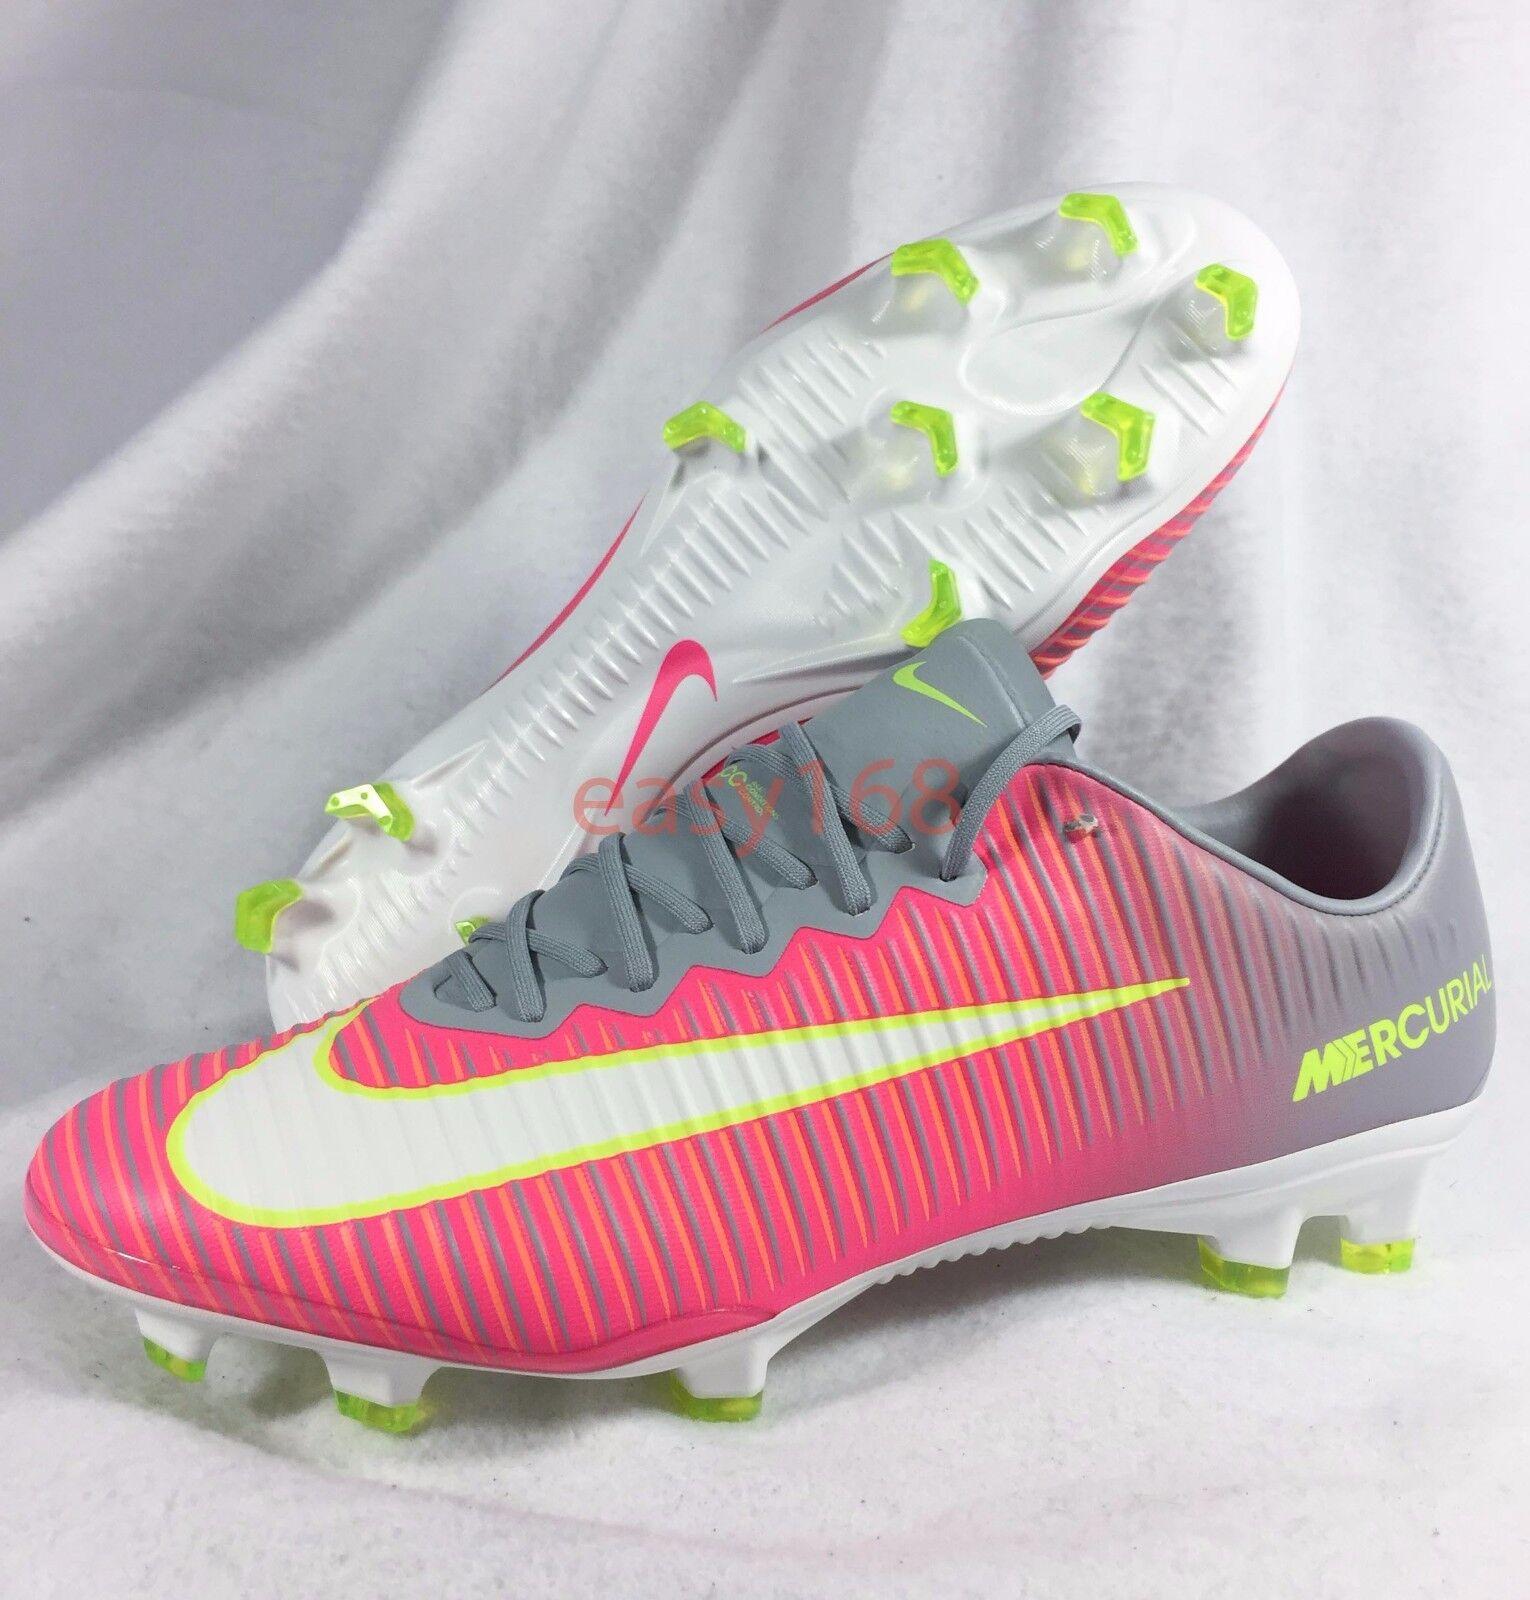 New Nike Mercurial Vapor XI FG Sz 13 WMNS Soccer 45.5 Cleats 844235 Pink Women's